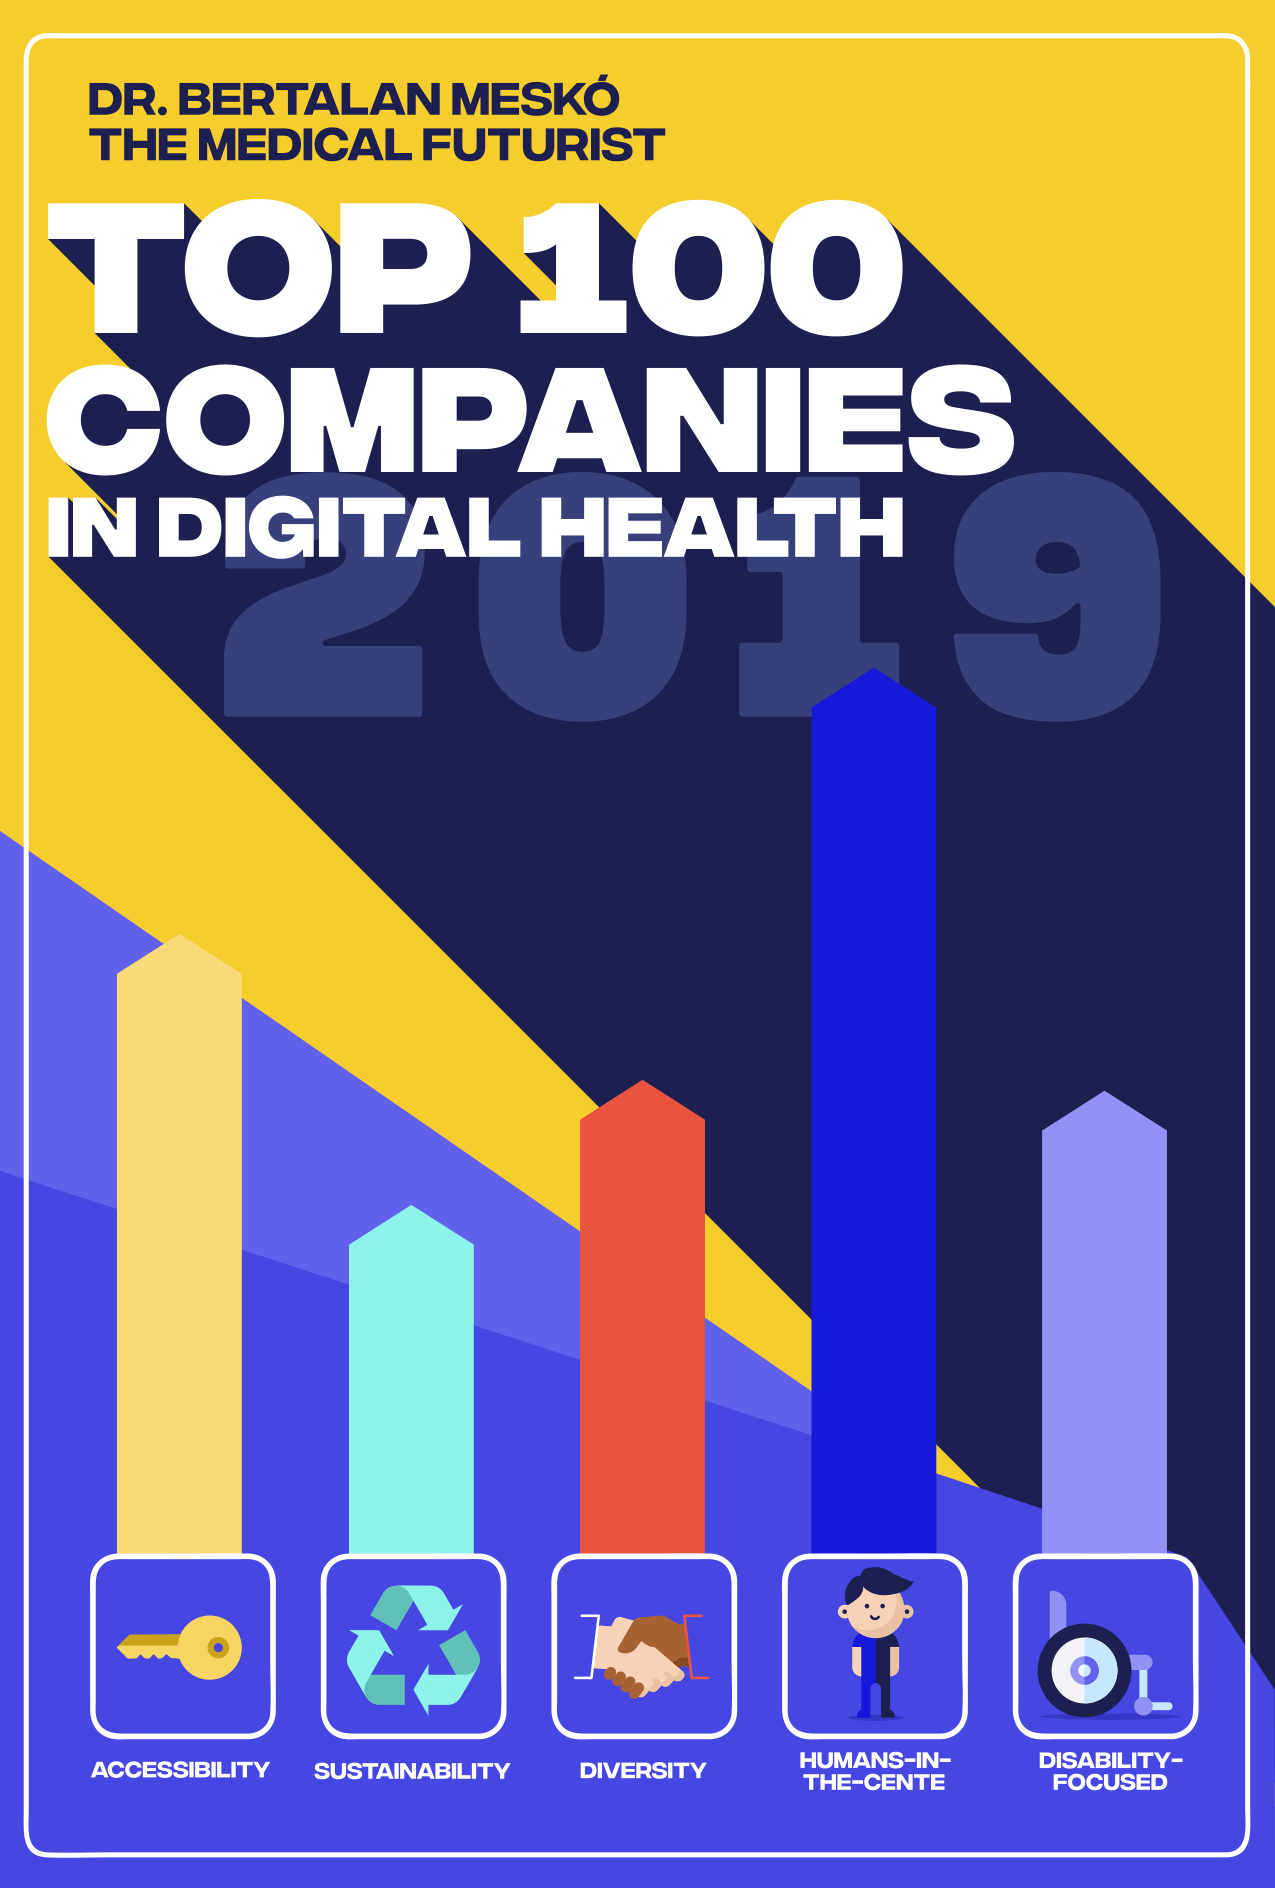 Top 100 Digital Health Companies Addressing Real-World Needs